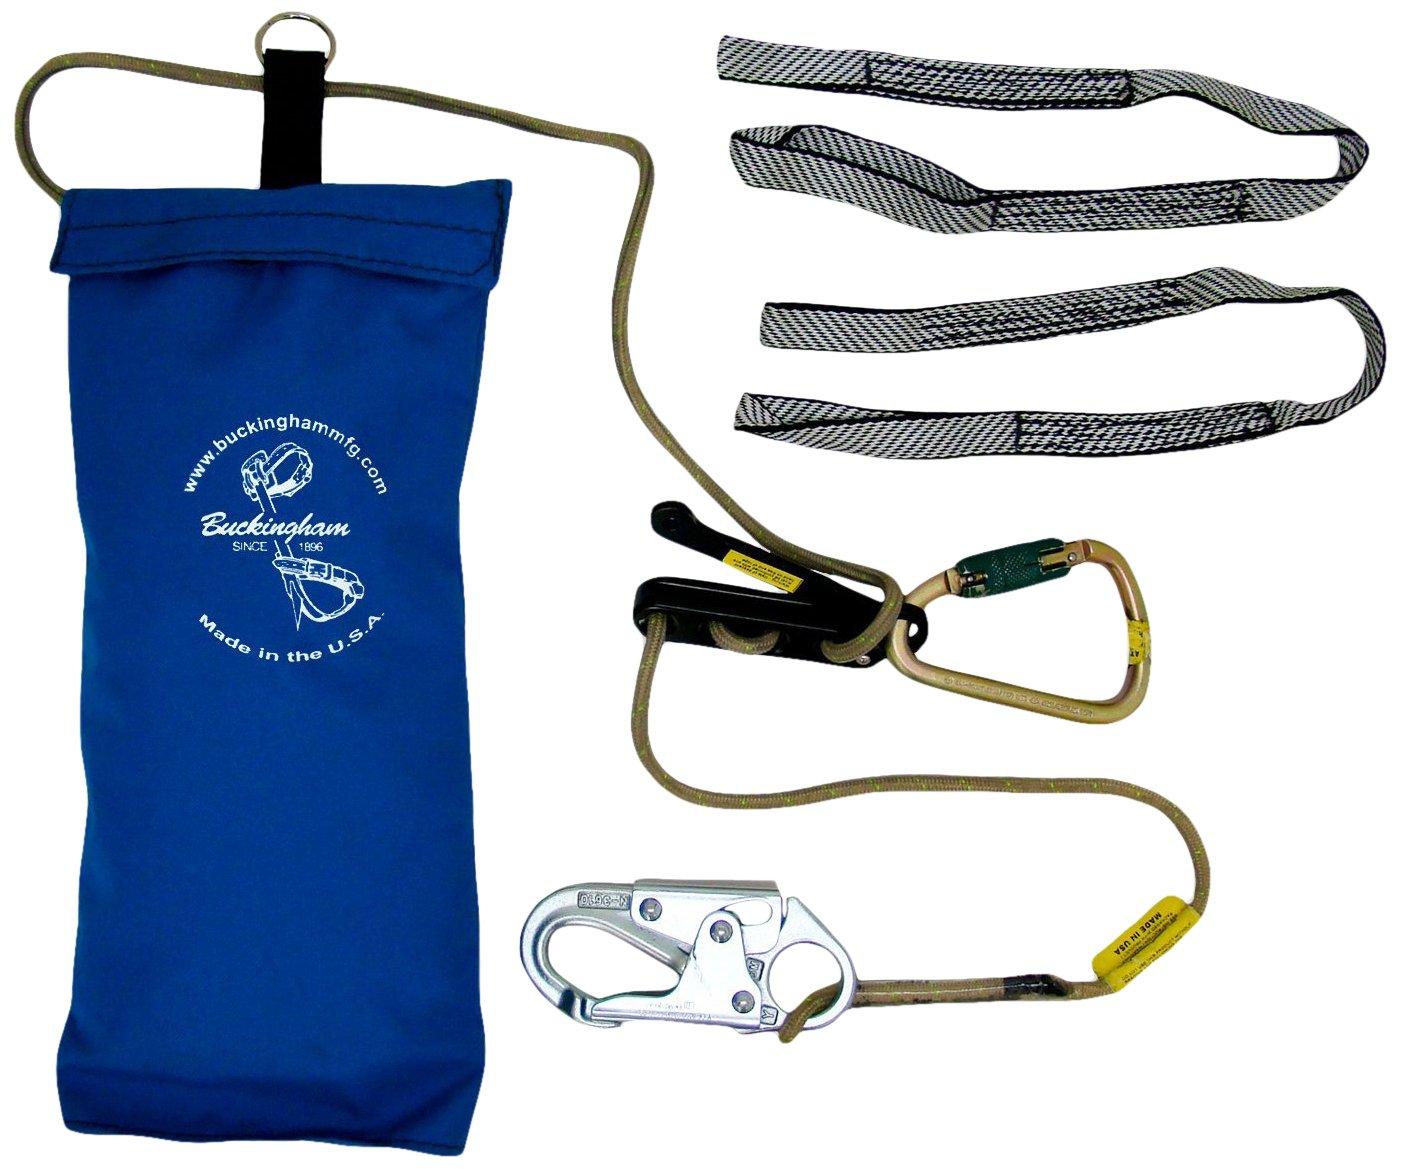 Buckingham 301SR-50 Self Rescue System